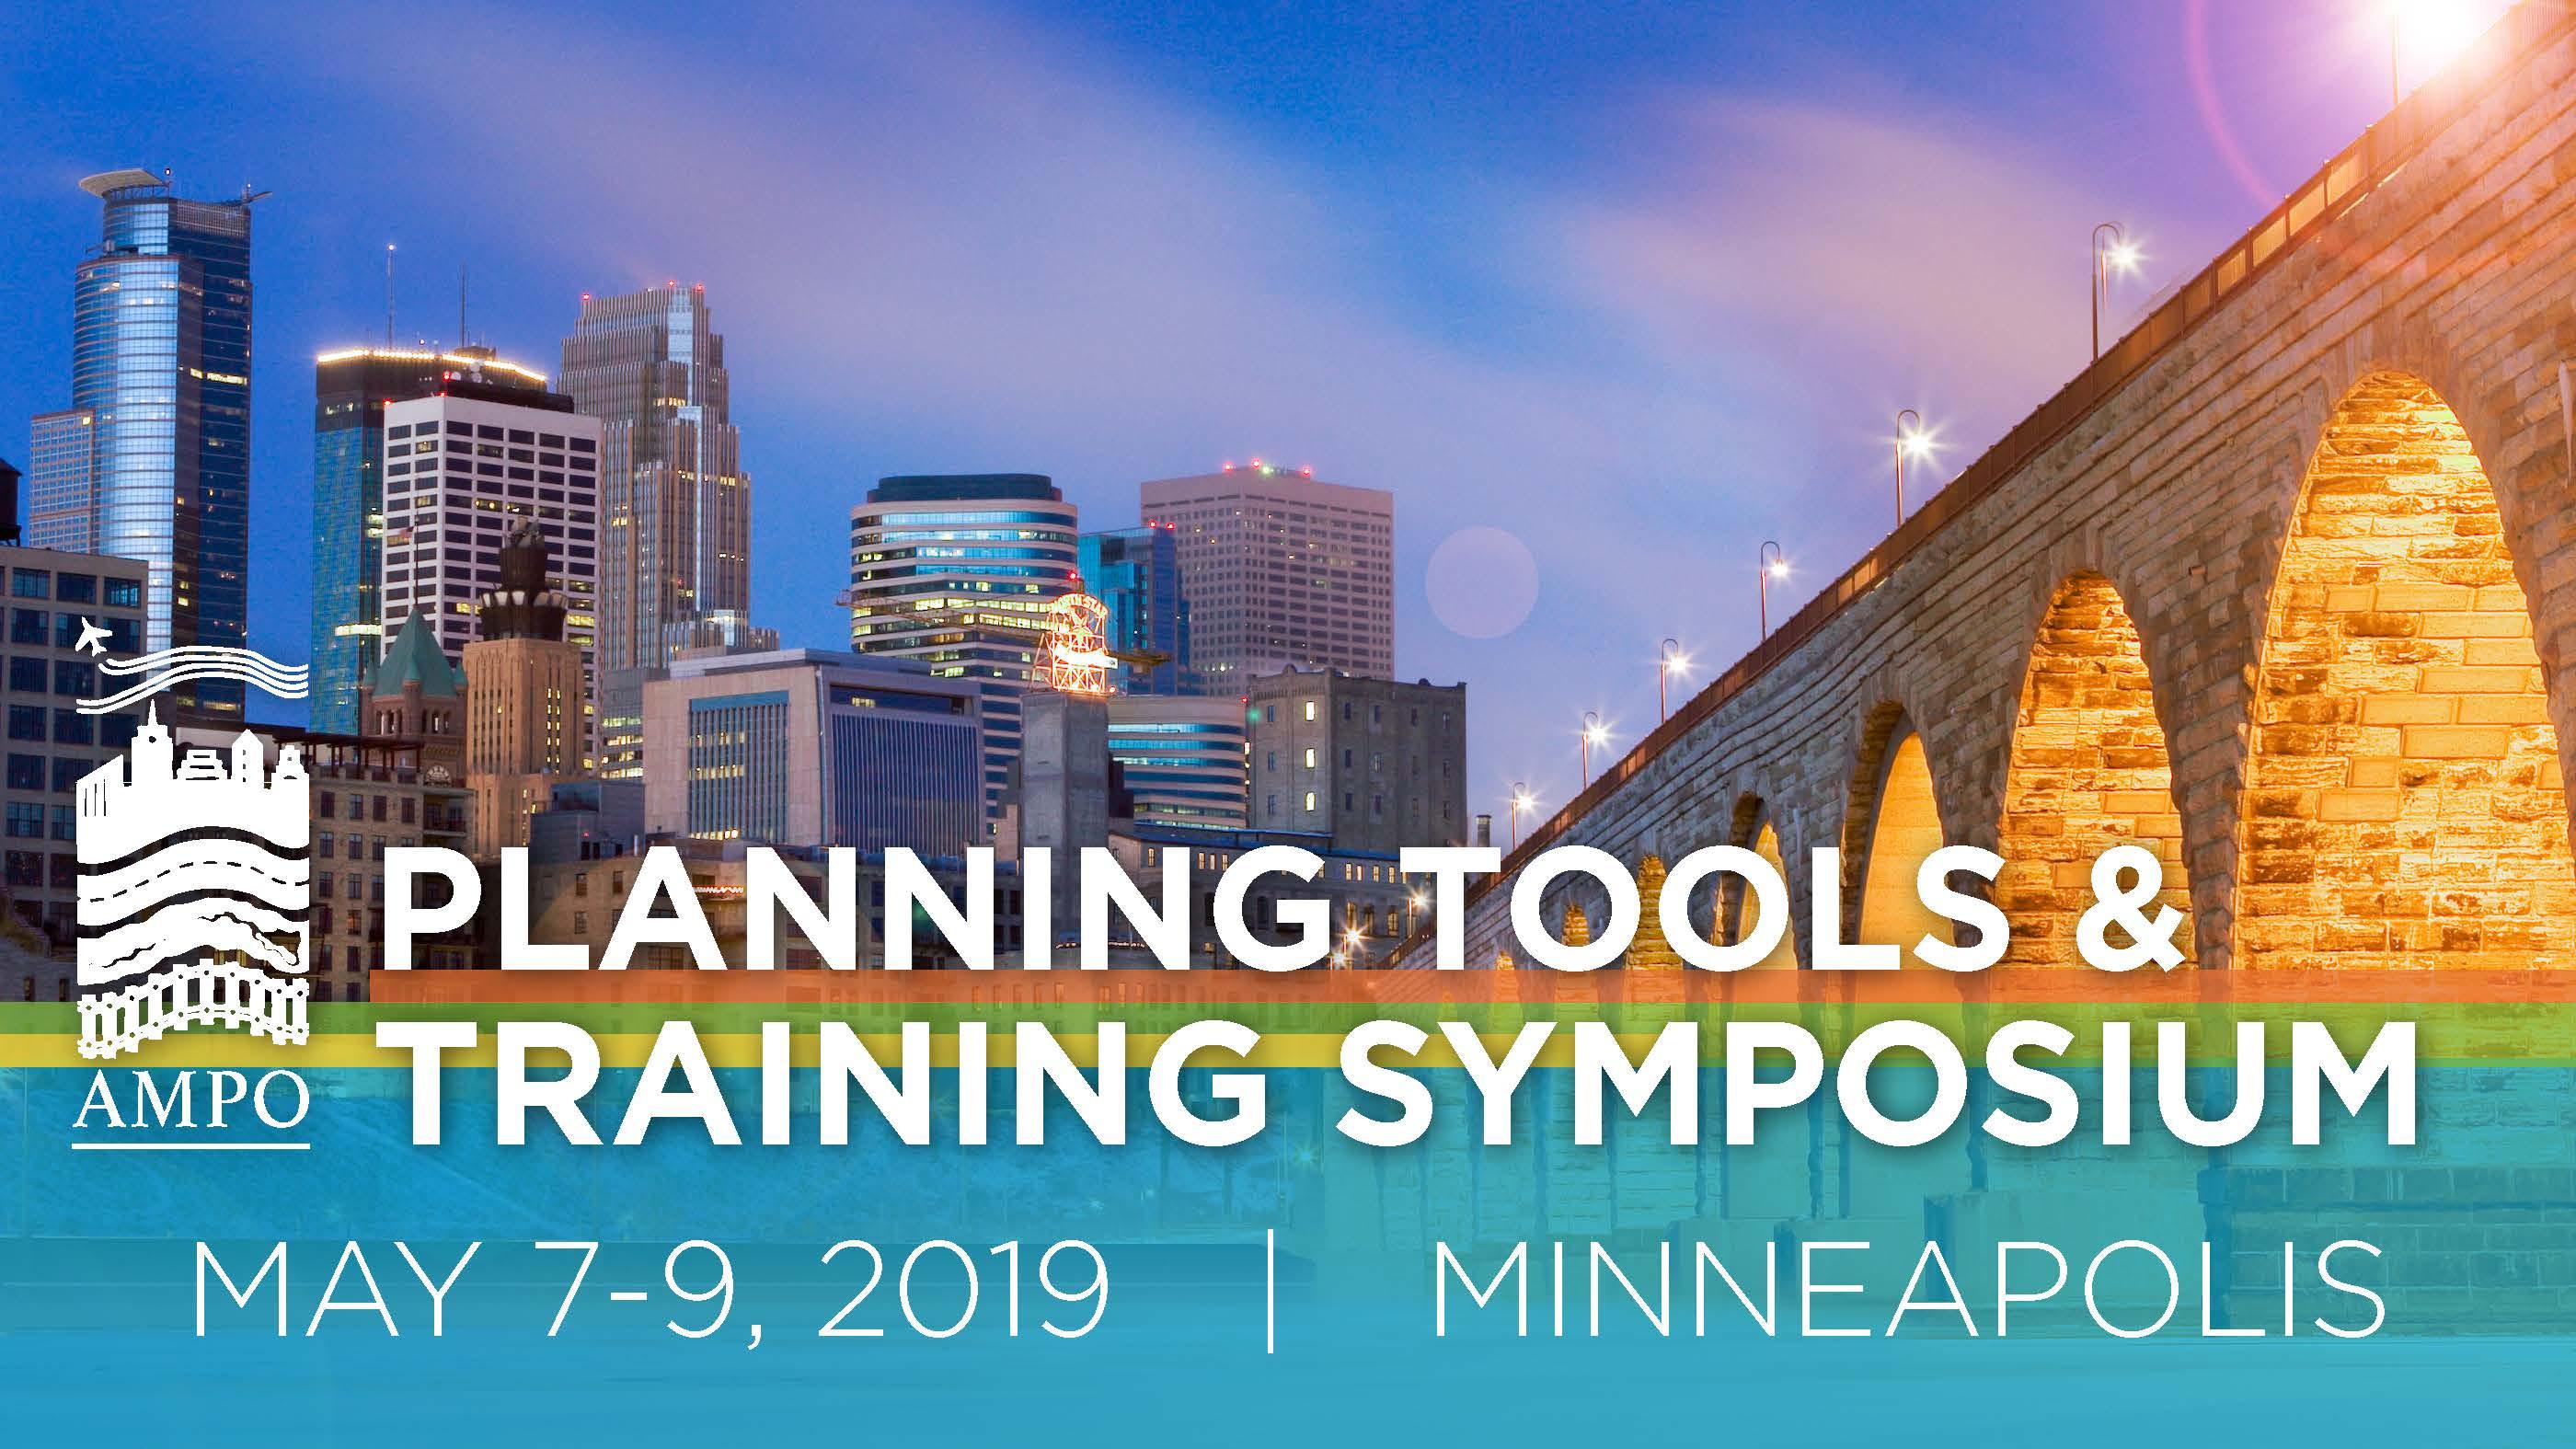 2019 AMPO Planning Tools & Training Symposium